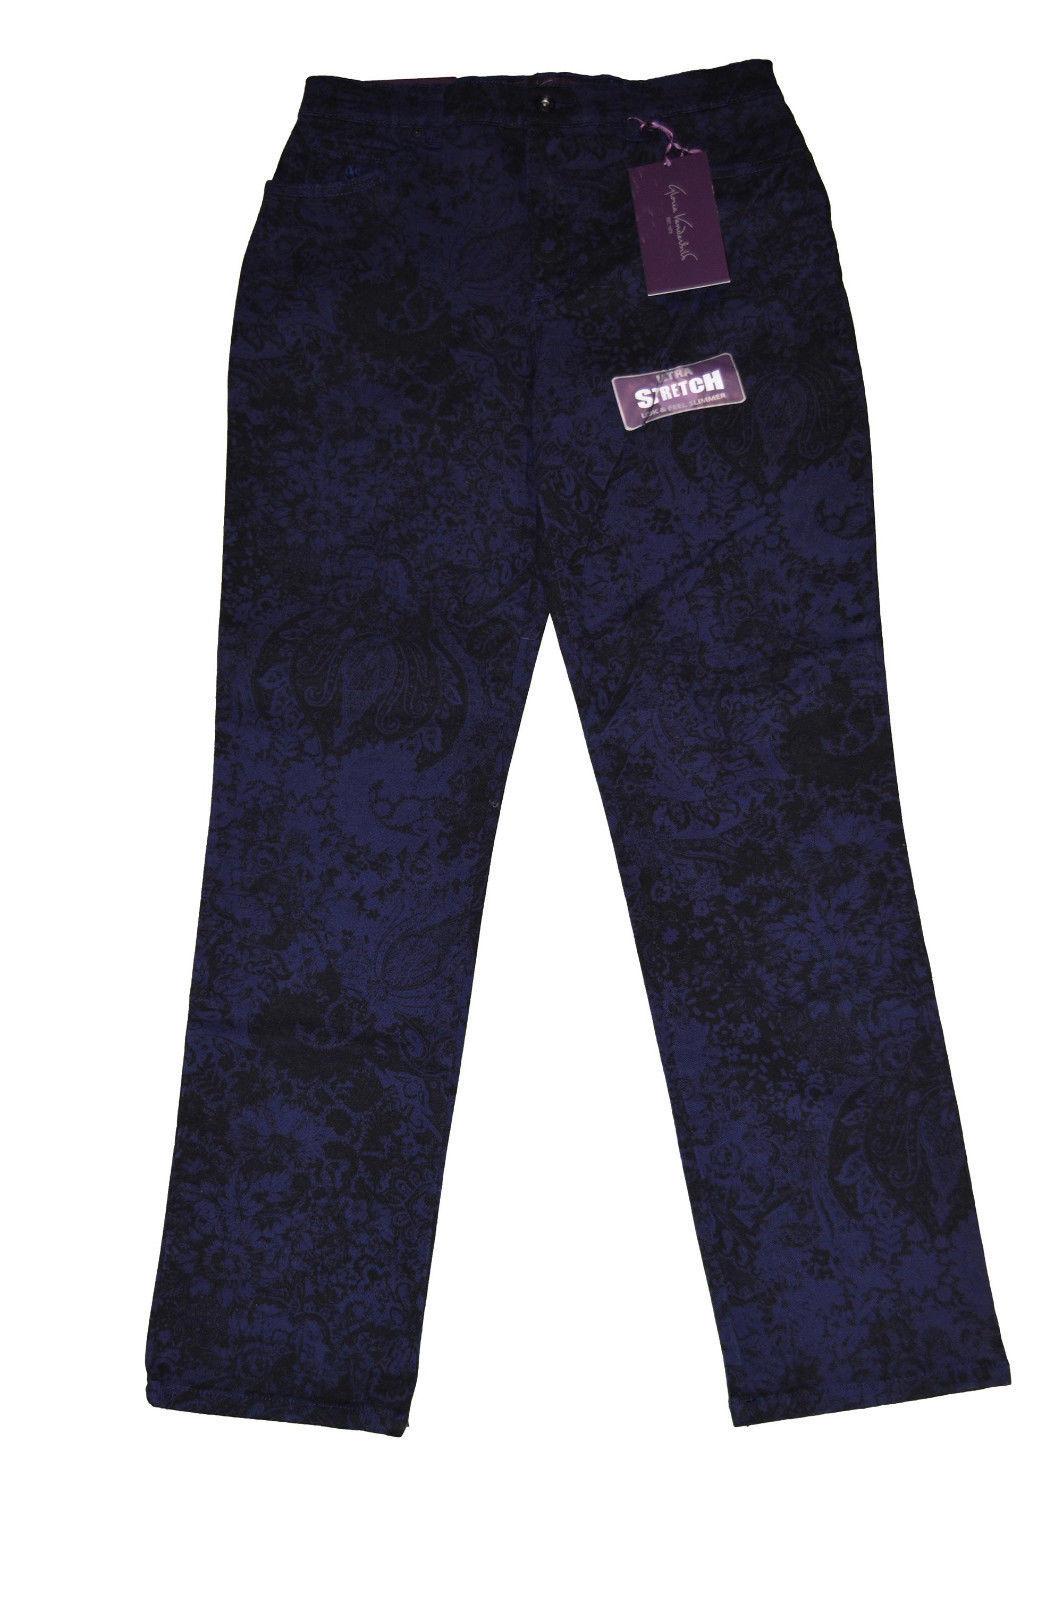 Women's Gloria Vanderbilt Amanda Classic Fit Tapered Leg Pants Sizes 8, 10, 14